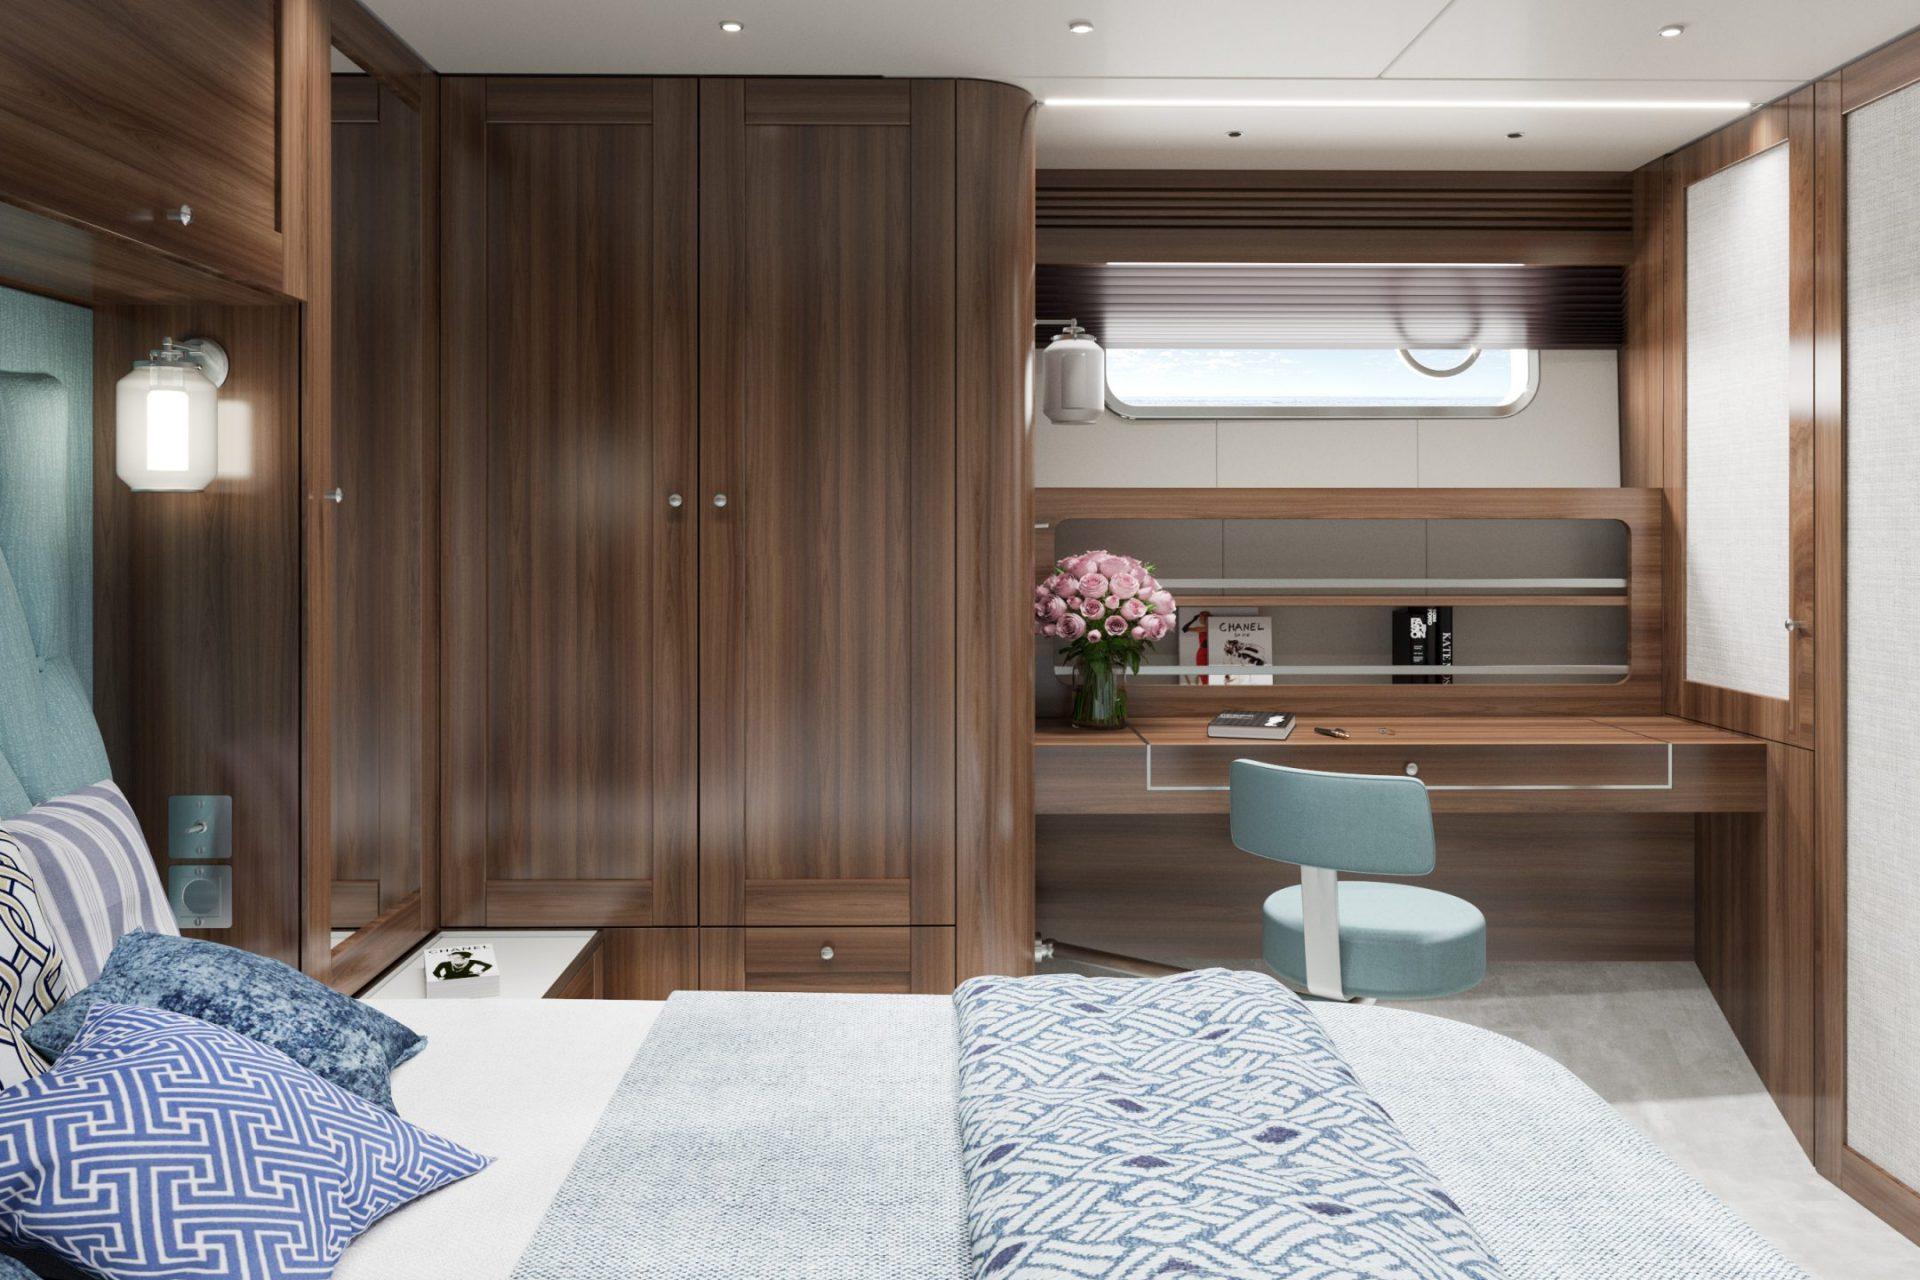 COR555 Master bedroom